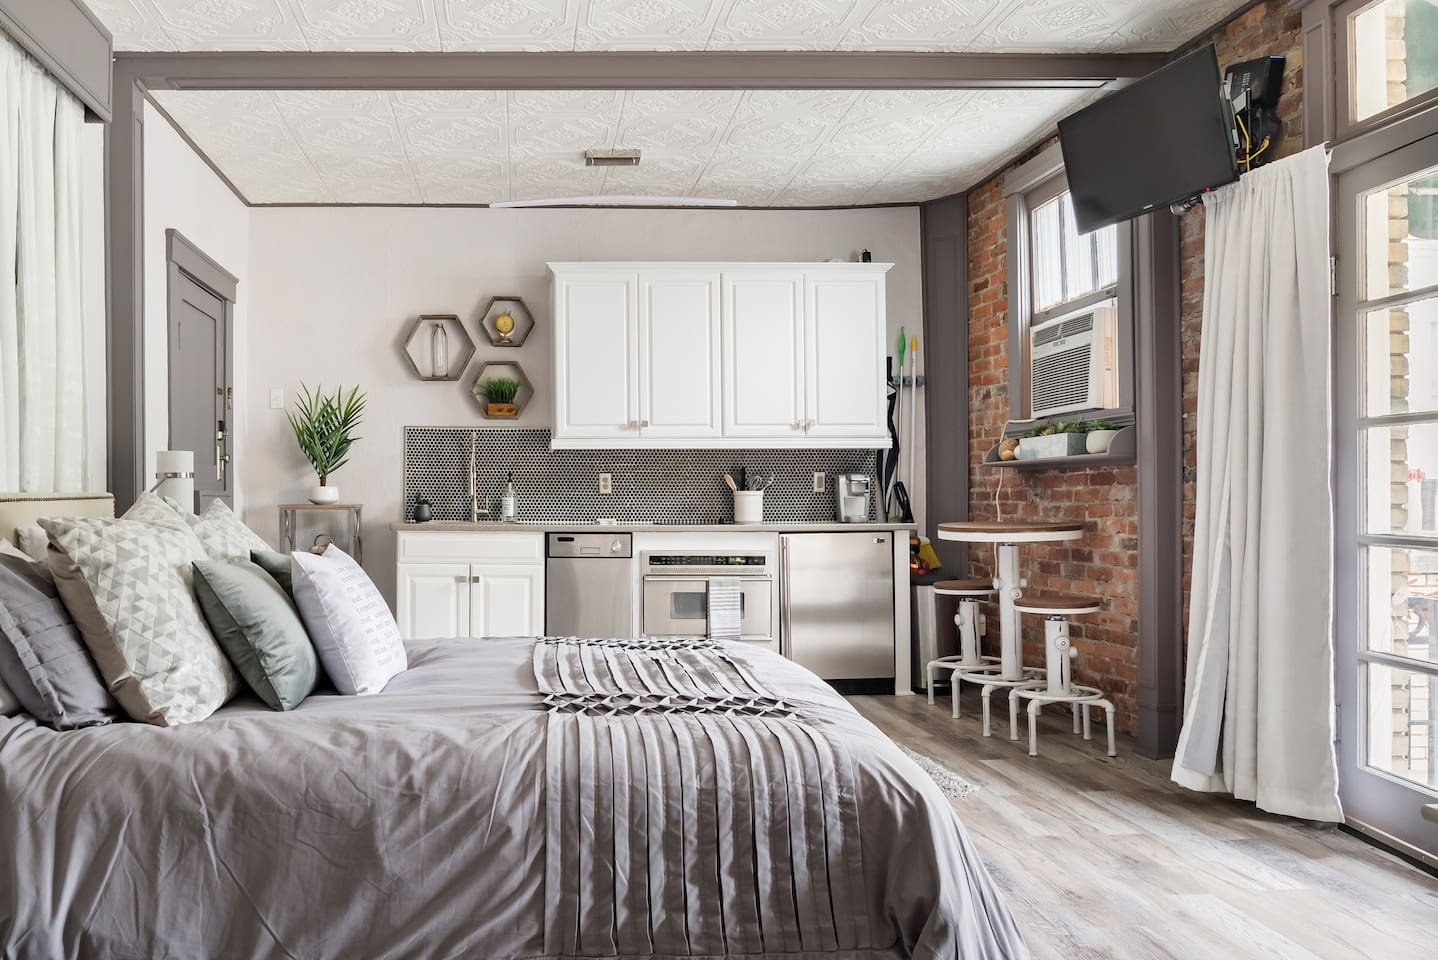 Urban Chic Studio with Balcony Airbnb in Savannah